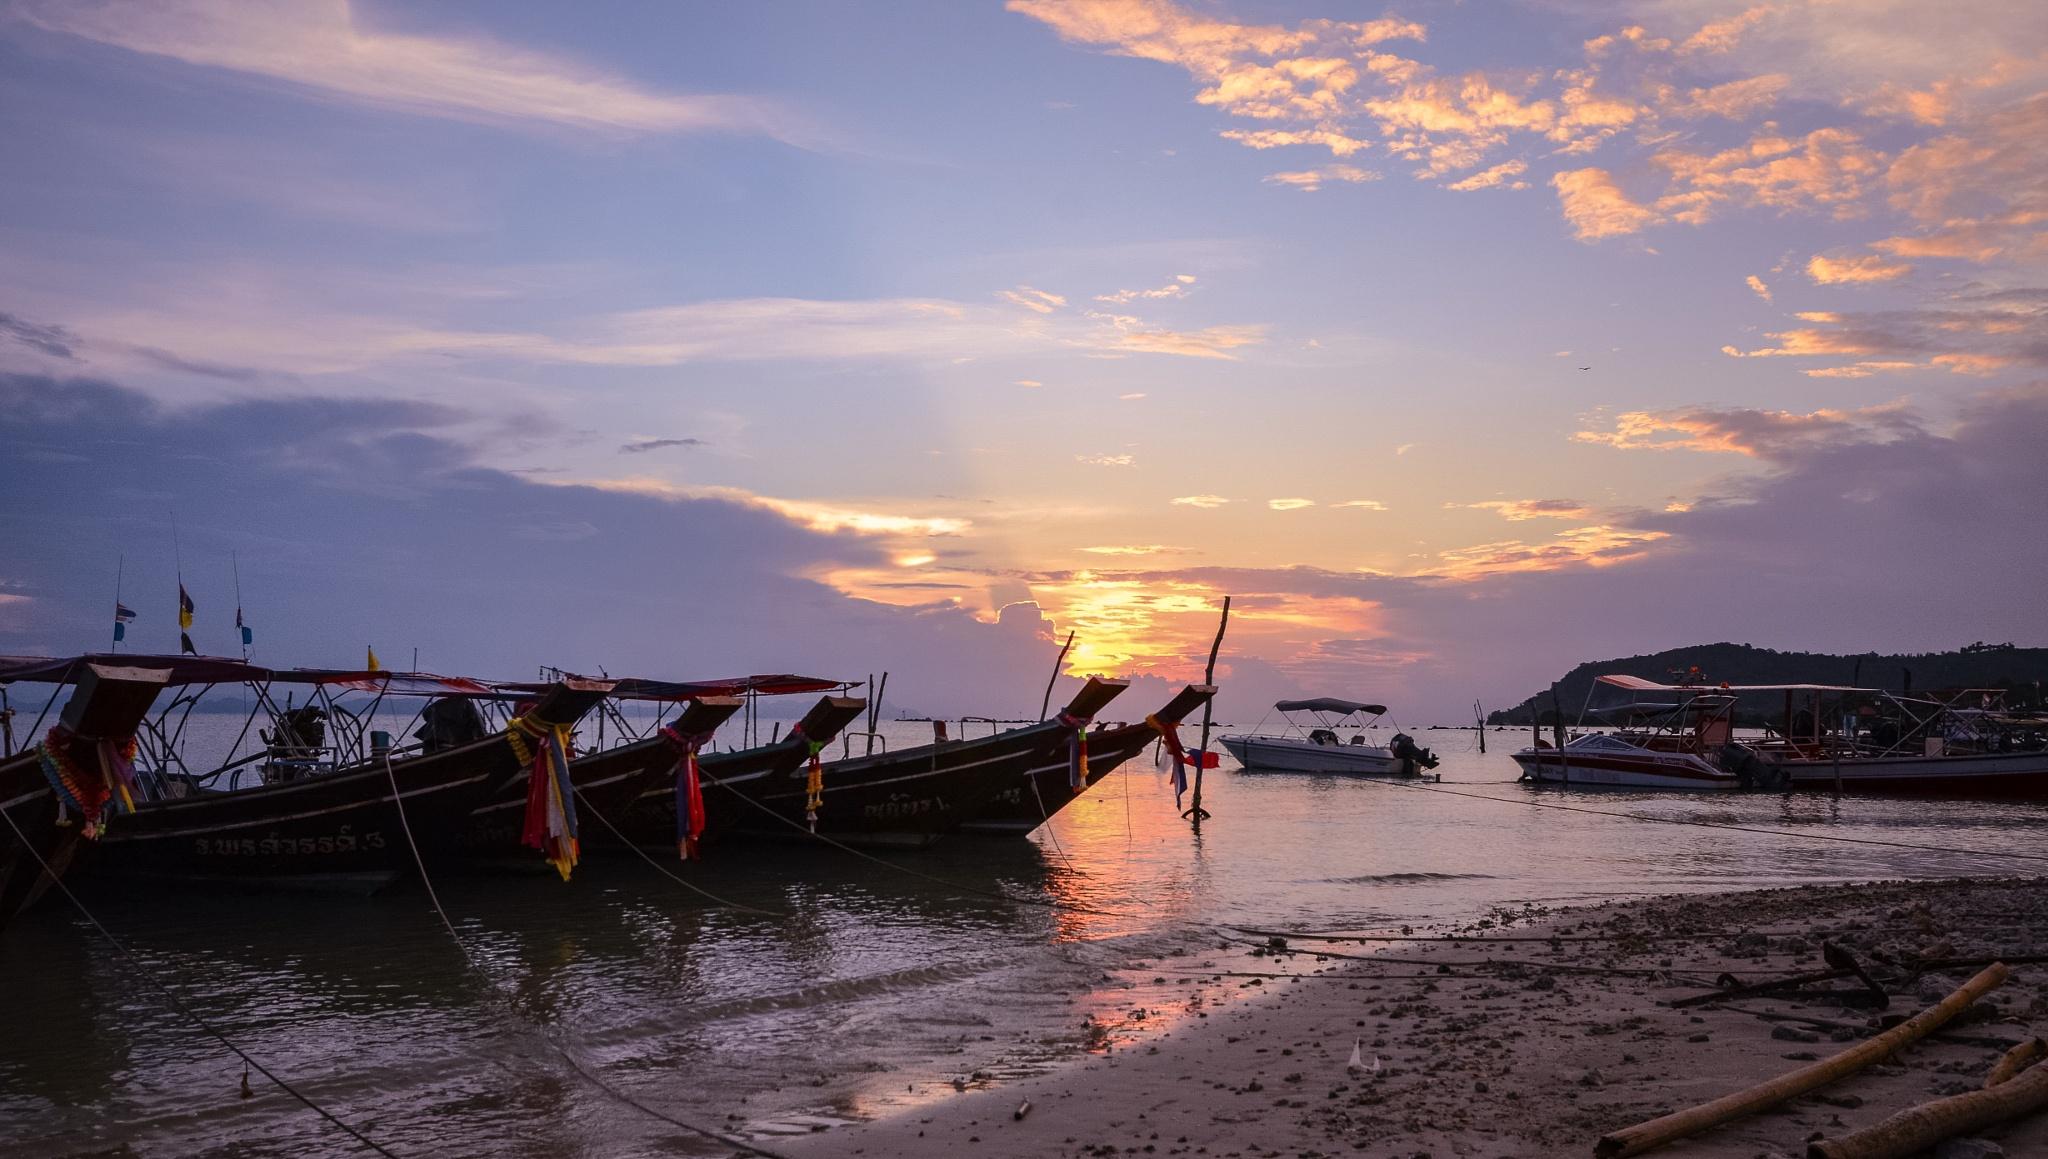 Samui boats by Wayne Baptiste